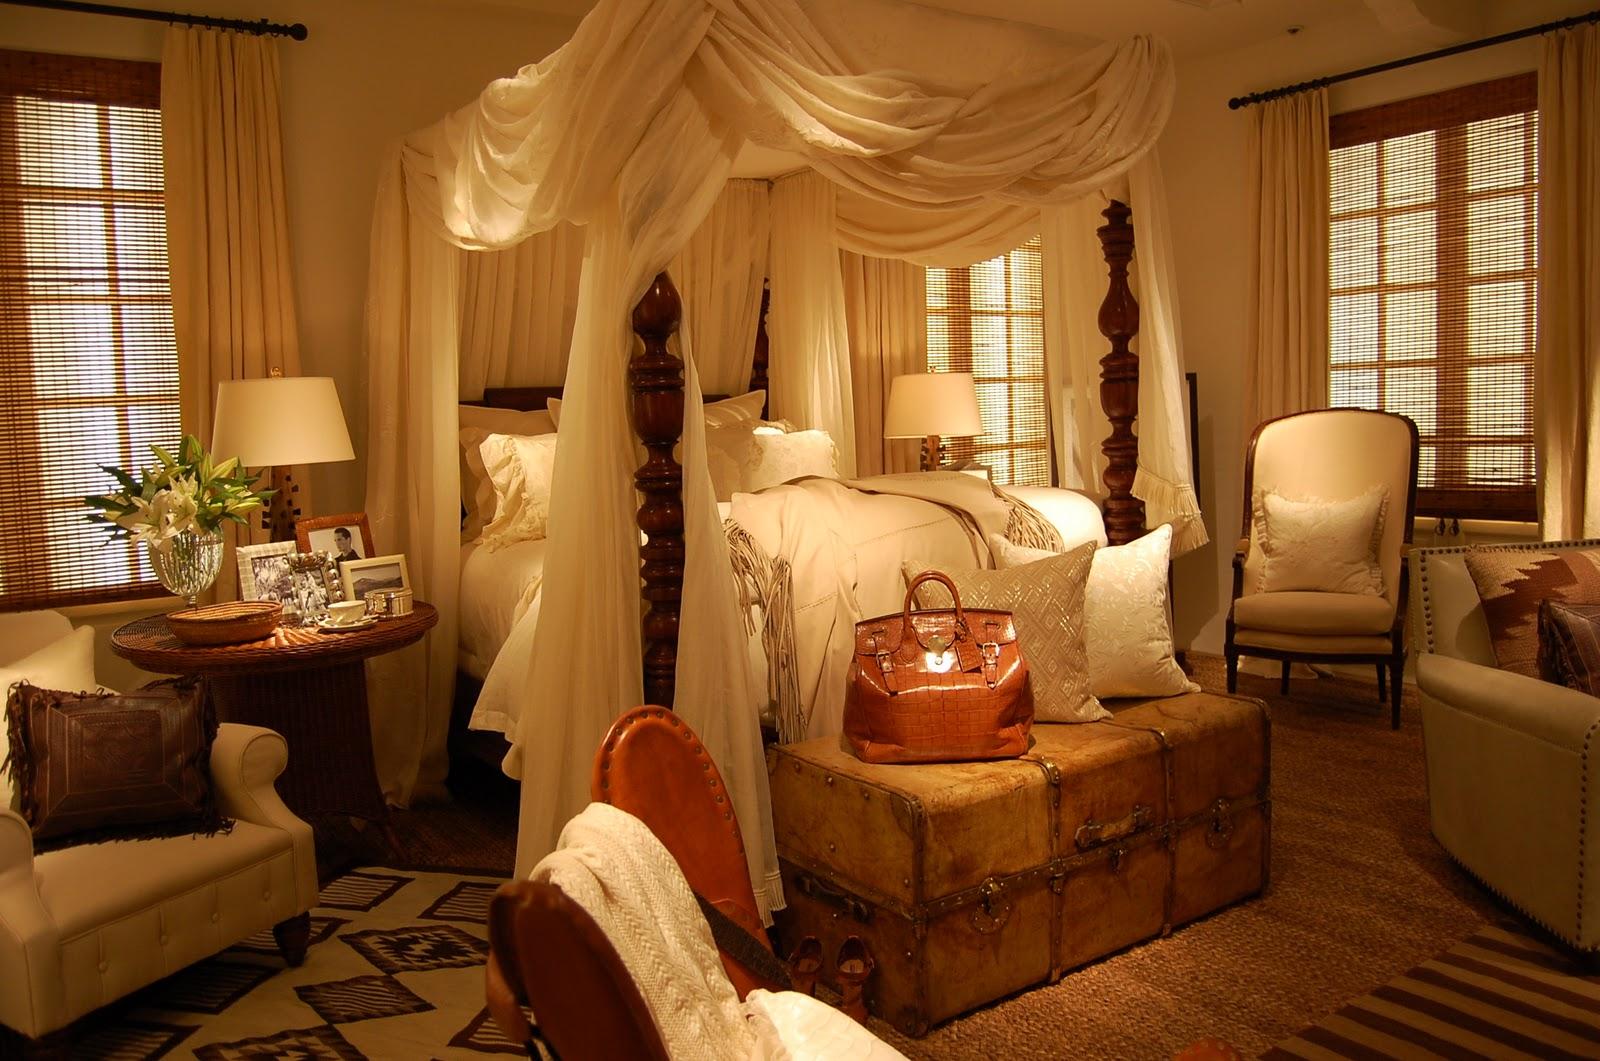 Chic soiree and spring at ralph lauren ellegant home design for Home interior furniture design